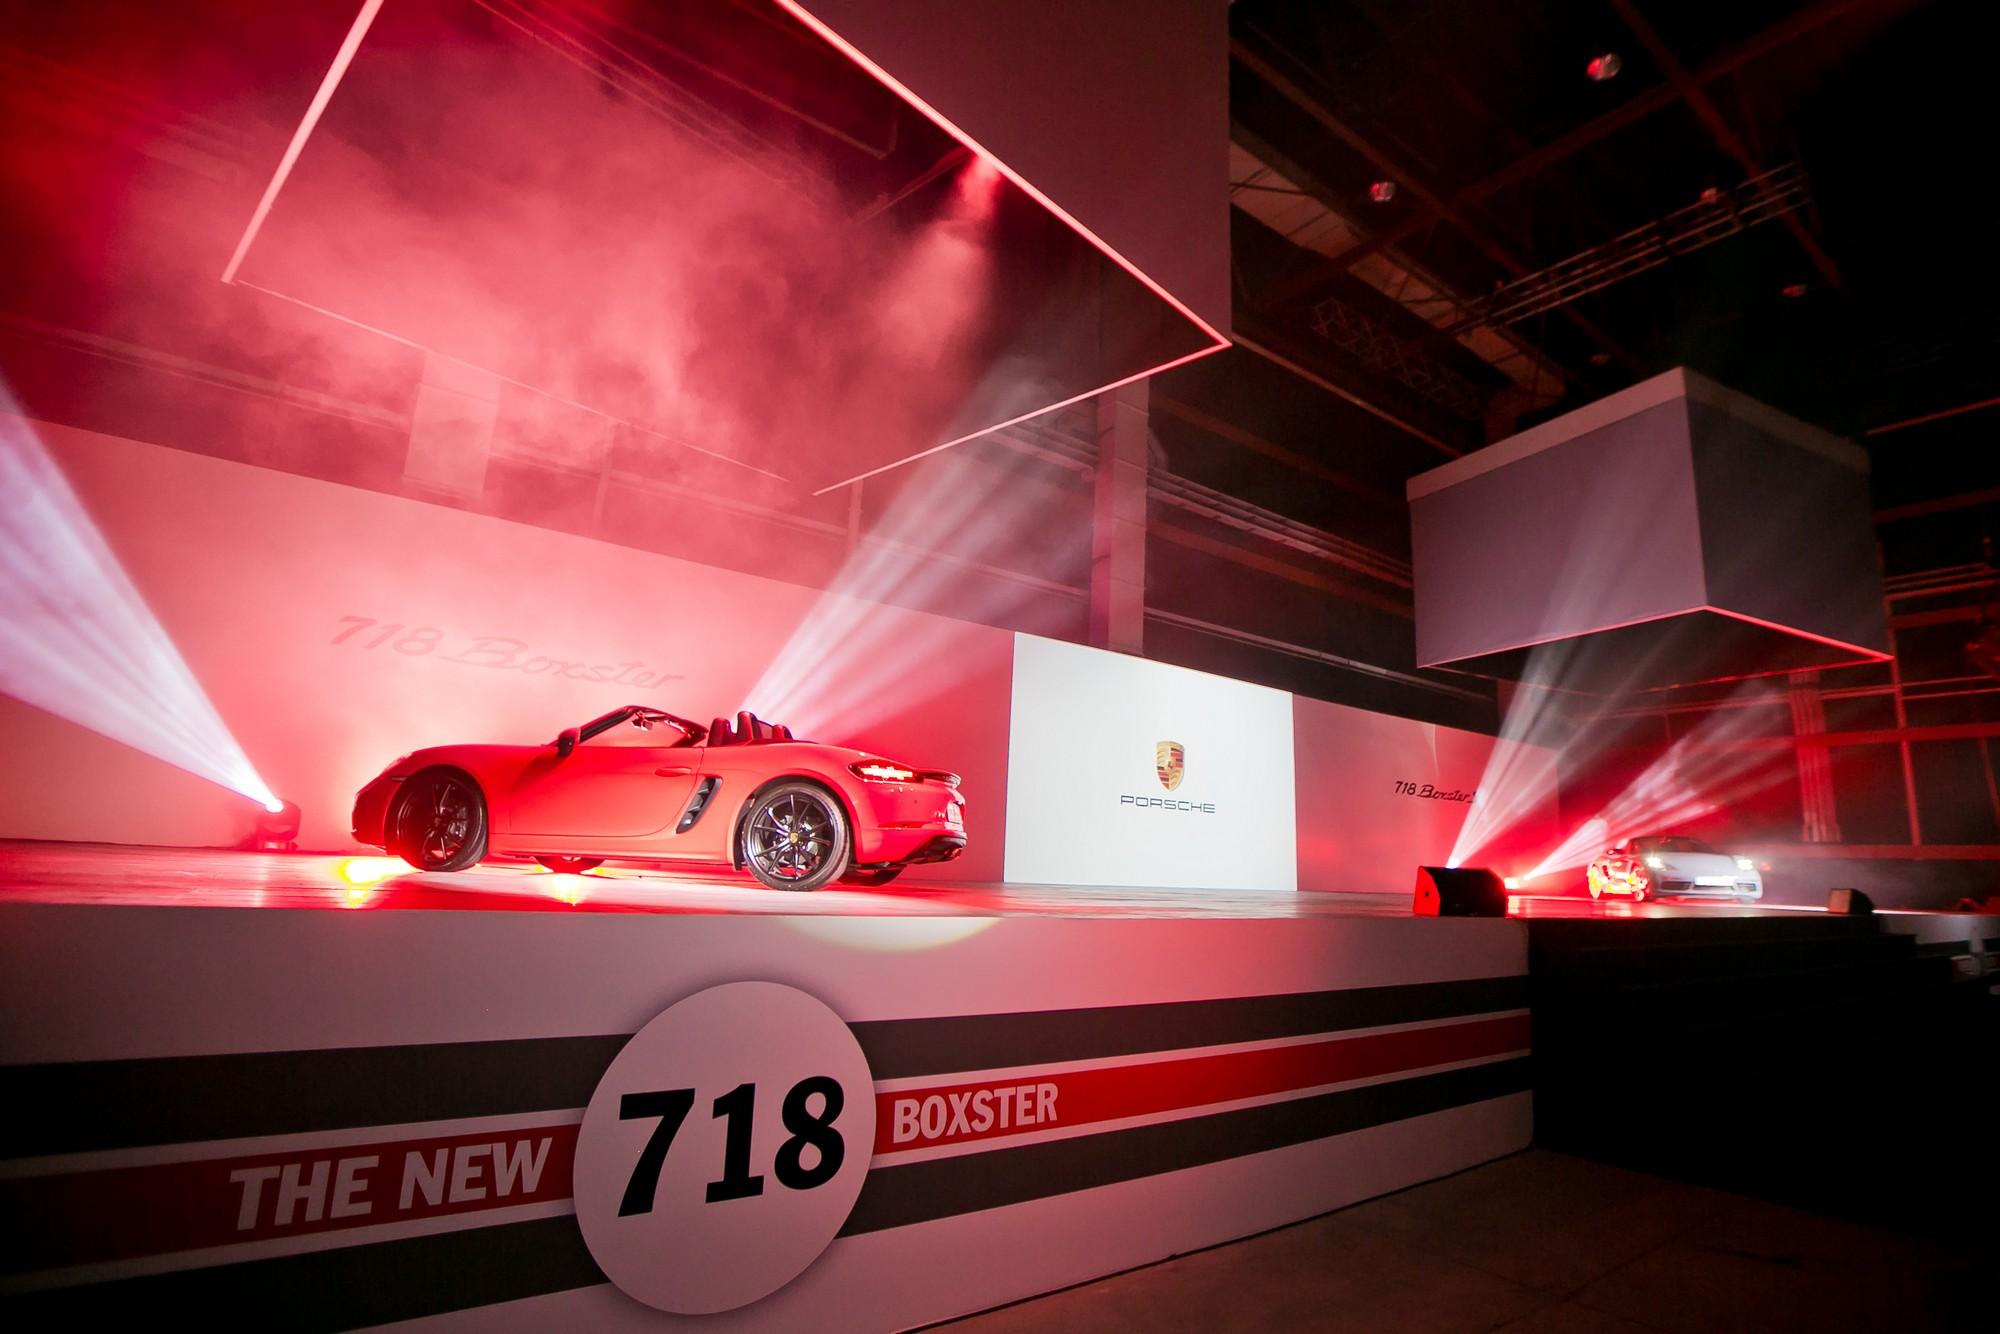 Porsche launches the 718 Boxster